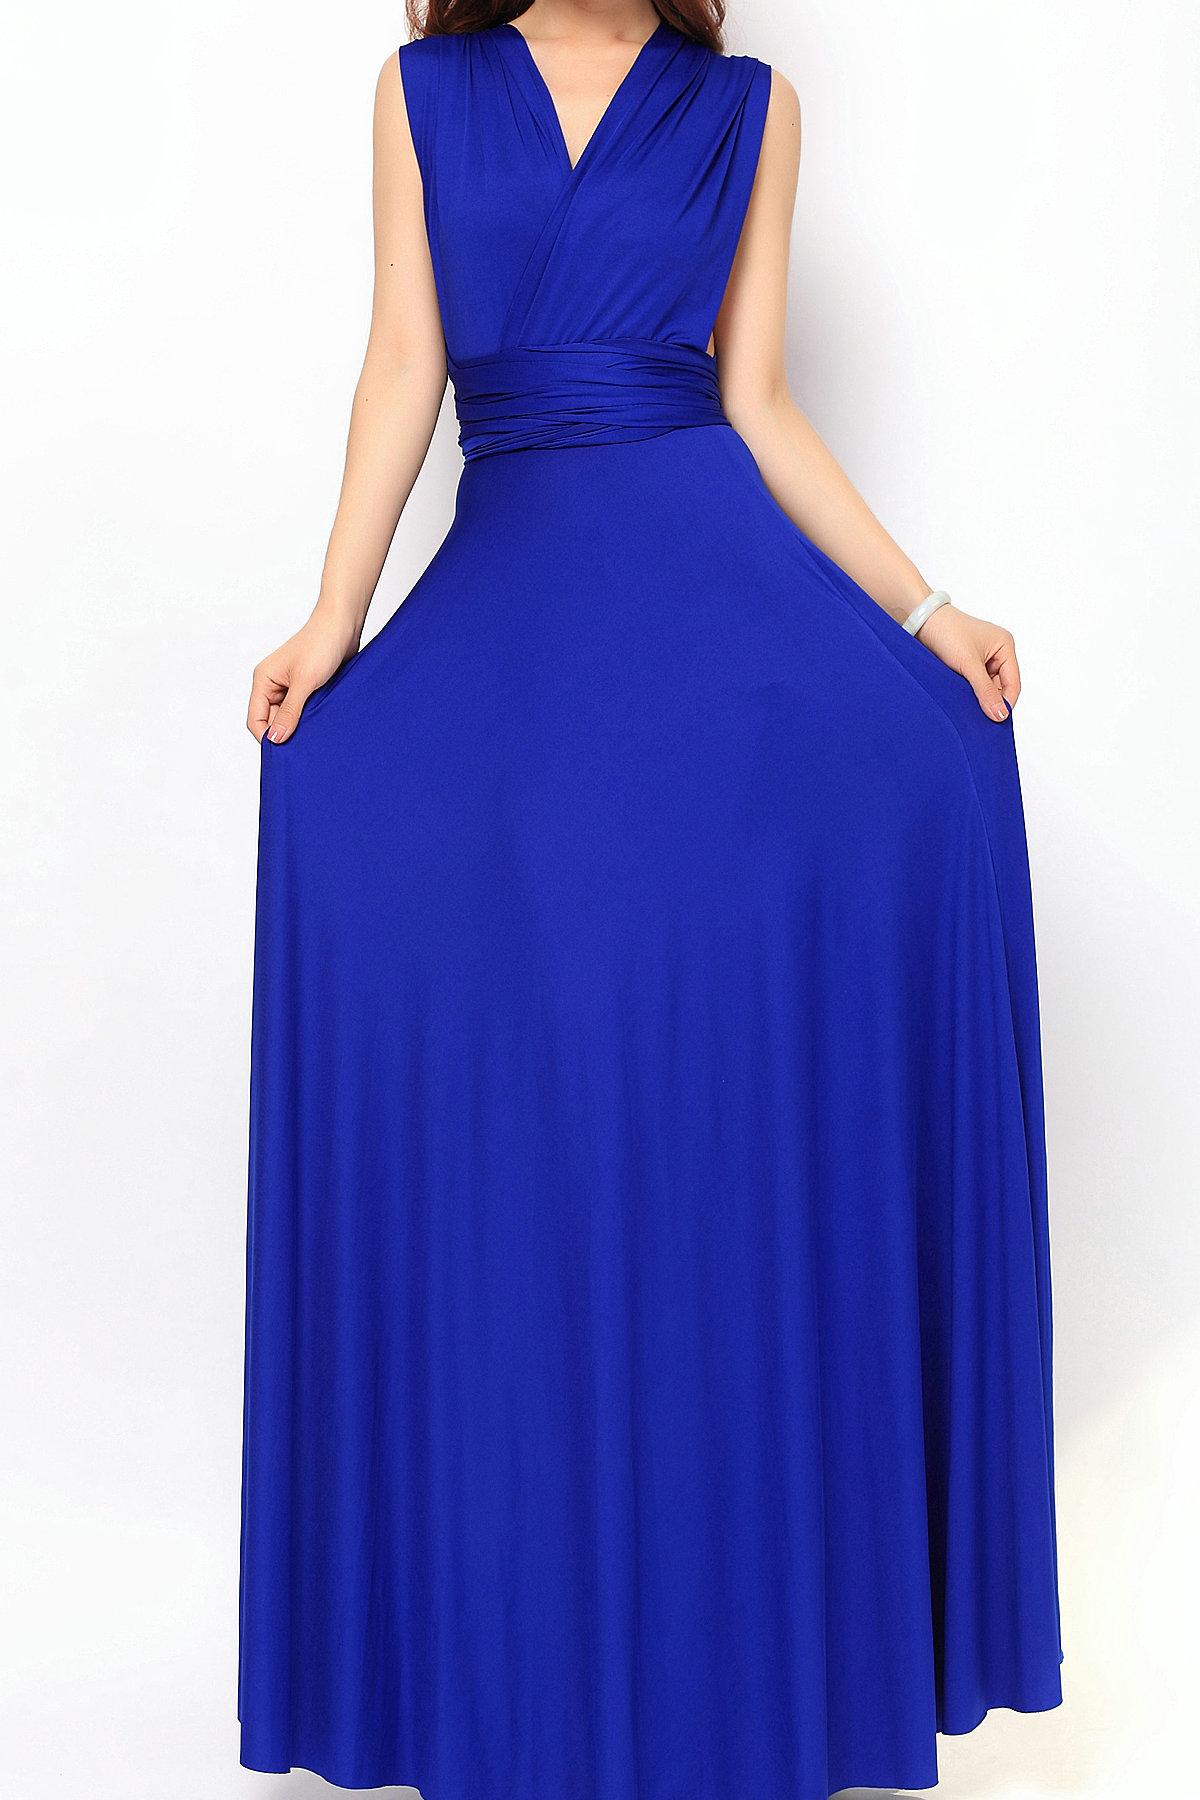 Multiway Dress Evening Length Classique Evening Gown